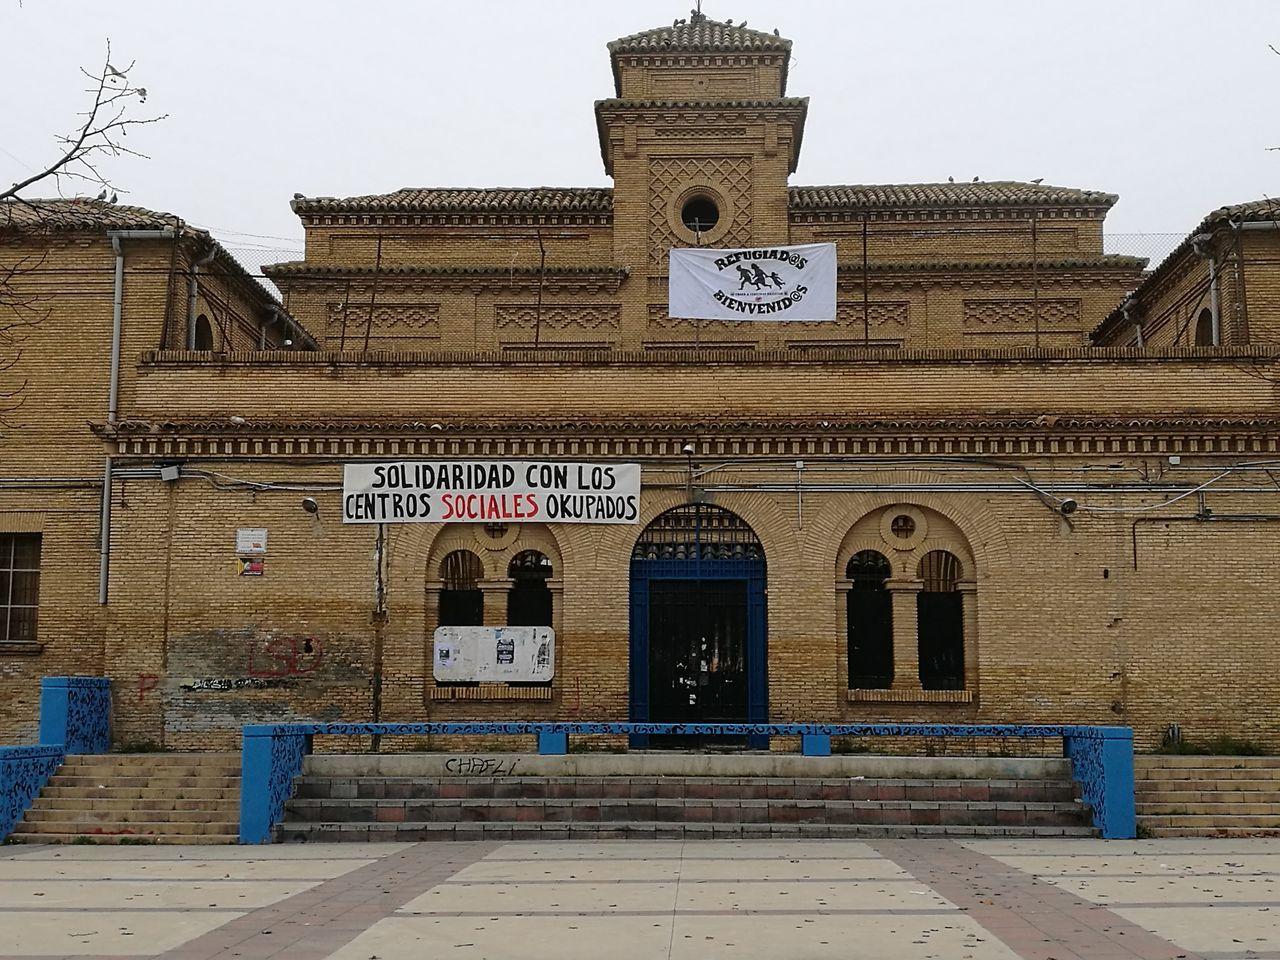 Building Exterior Façade Old Prison city Zaragoza